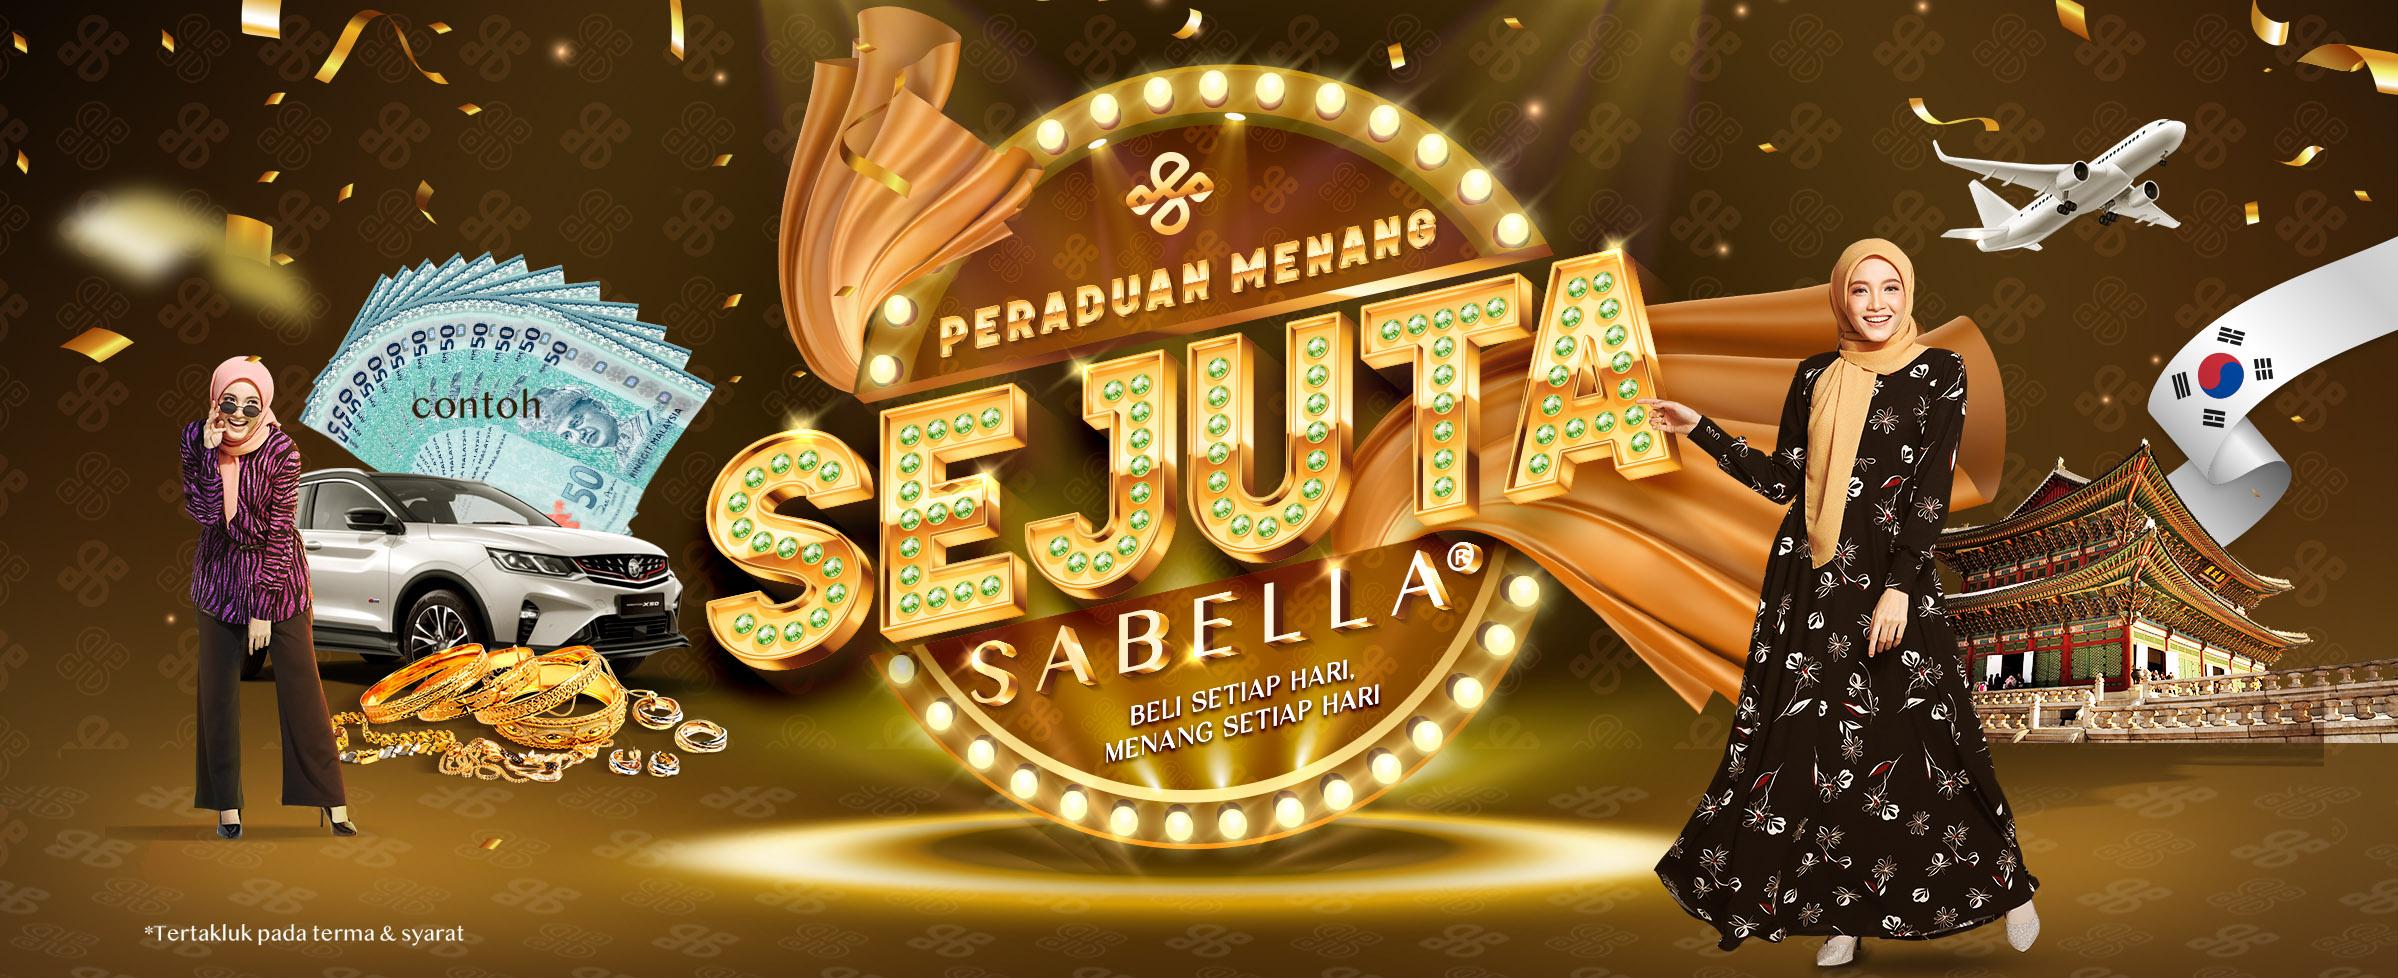 Contest Menang 1 Juta Sabella